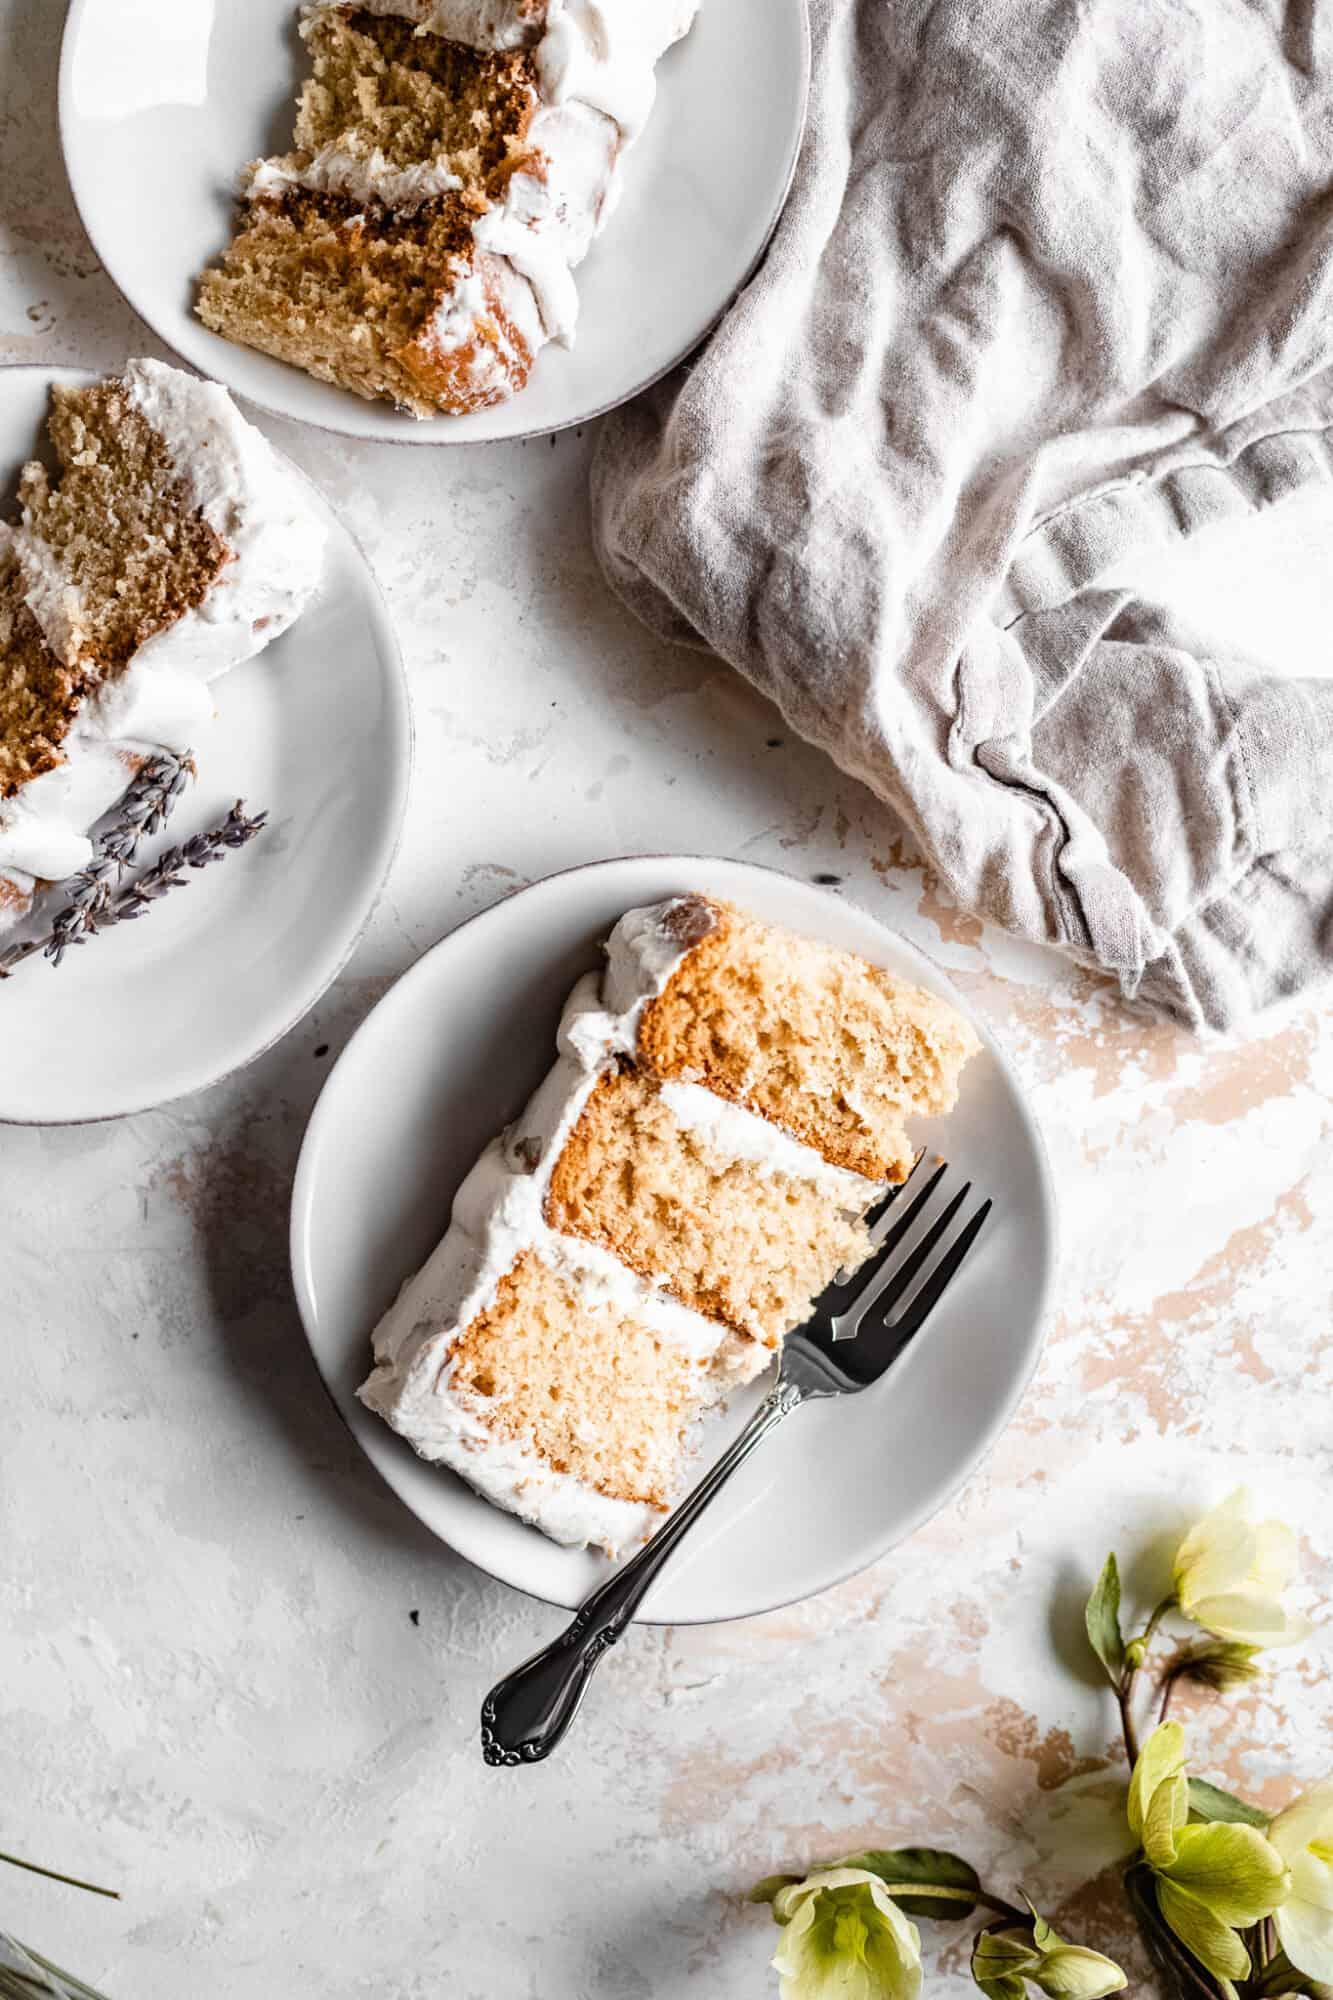 slices of vegan cake